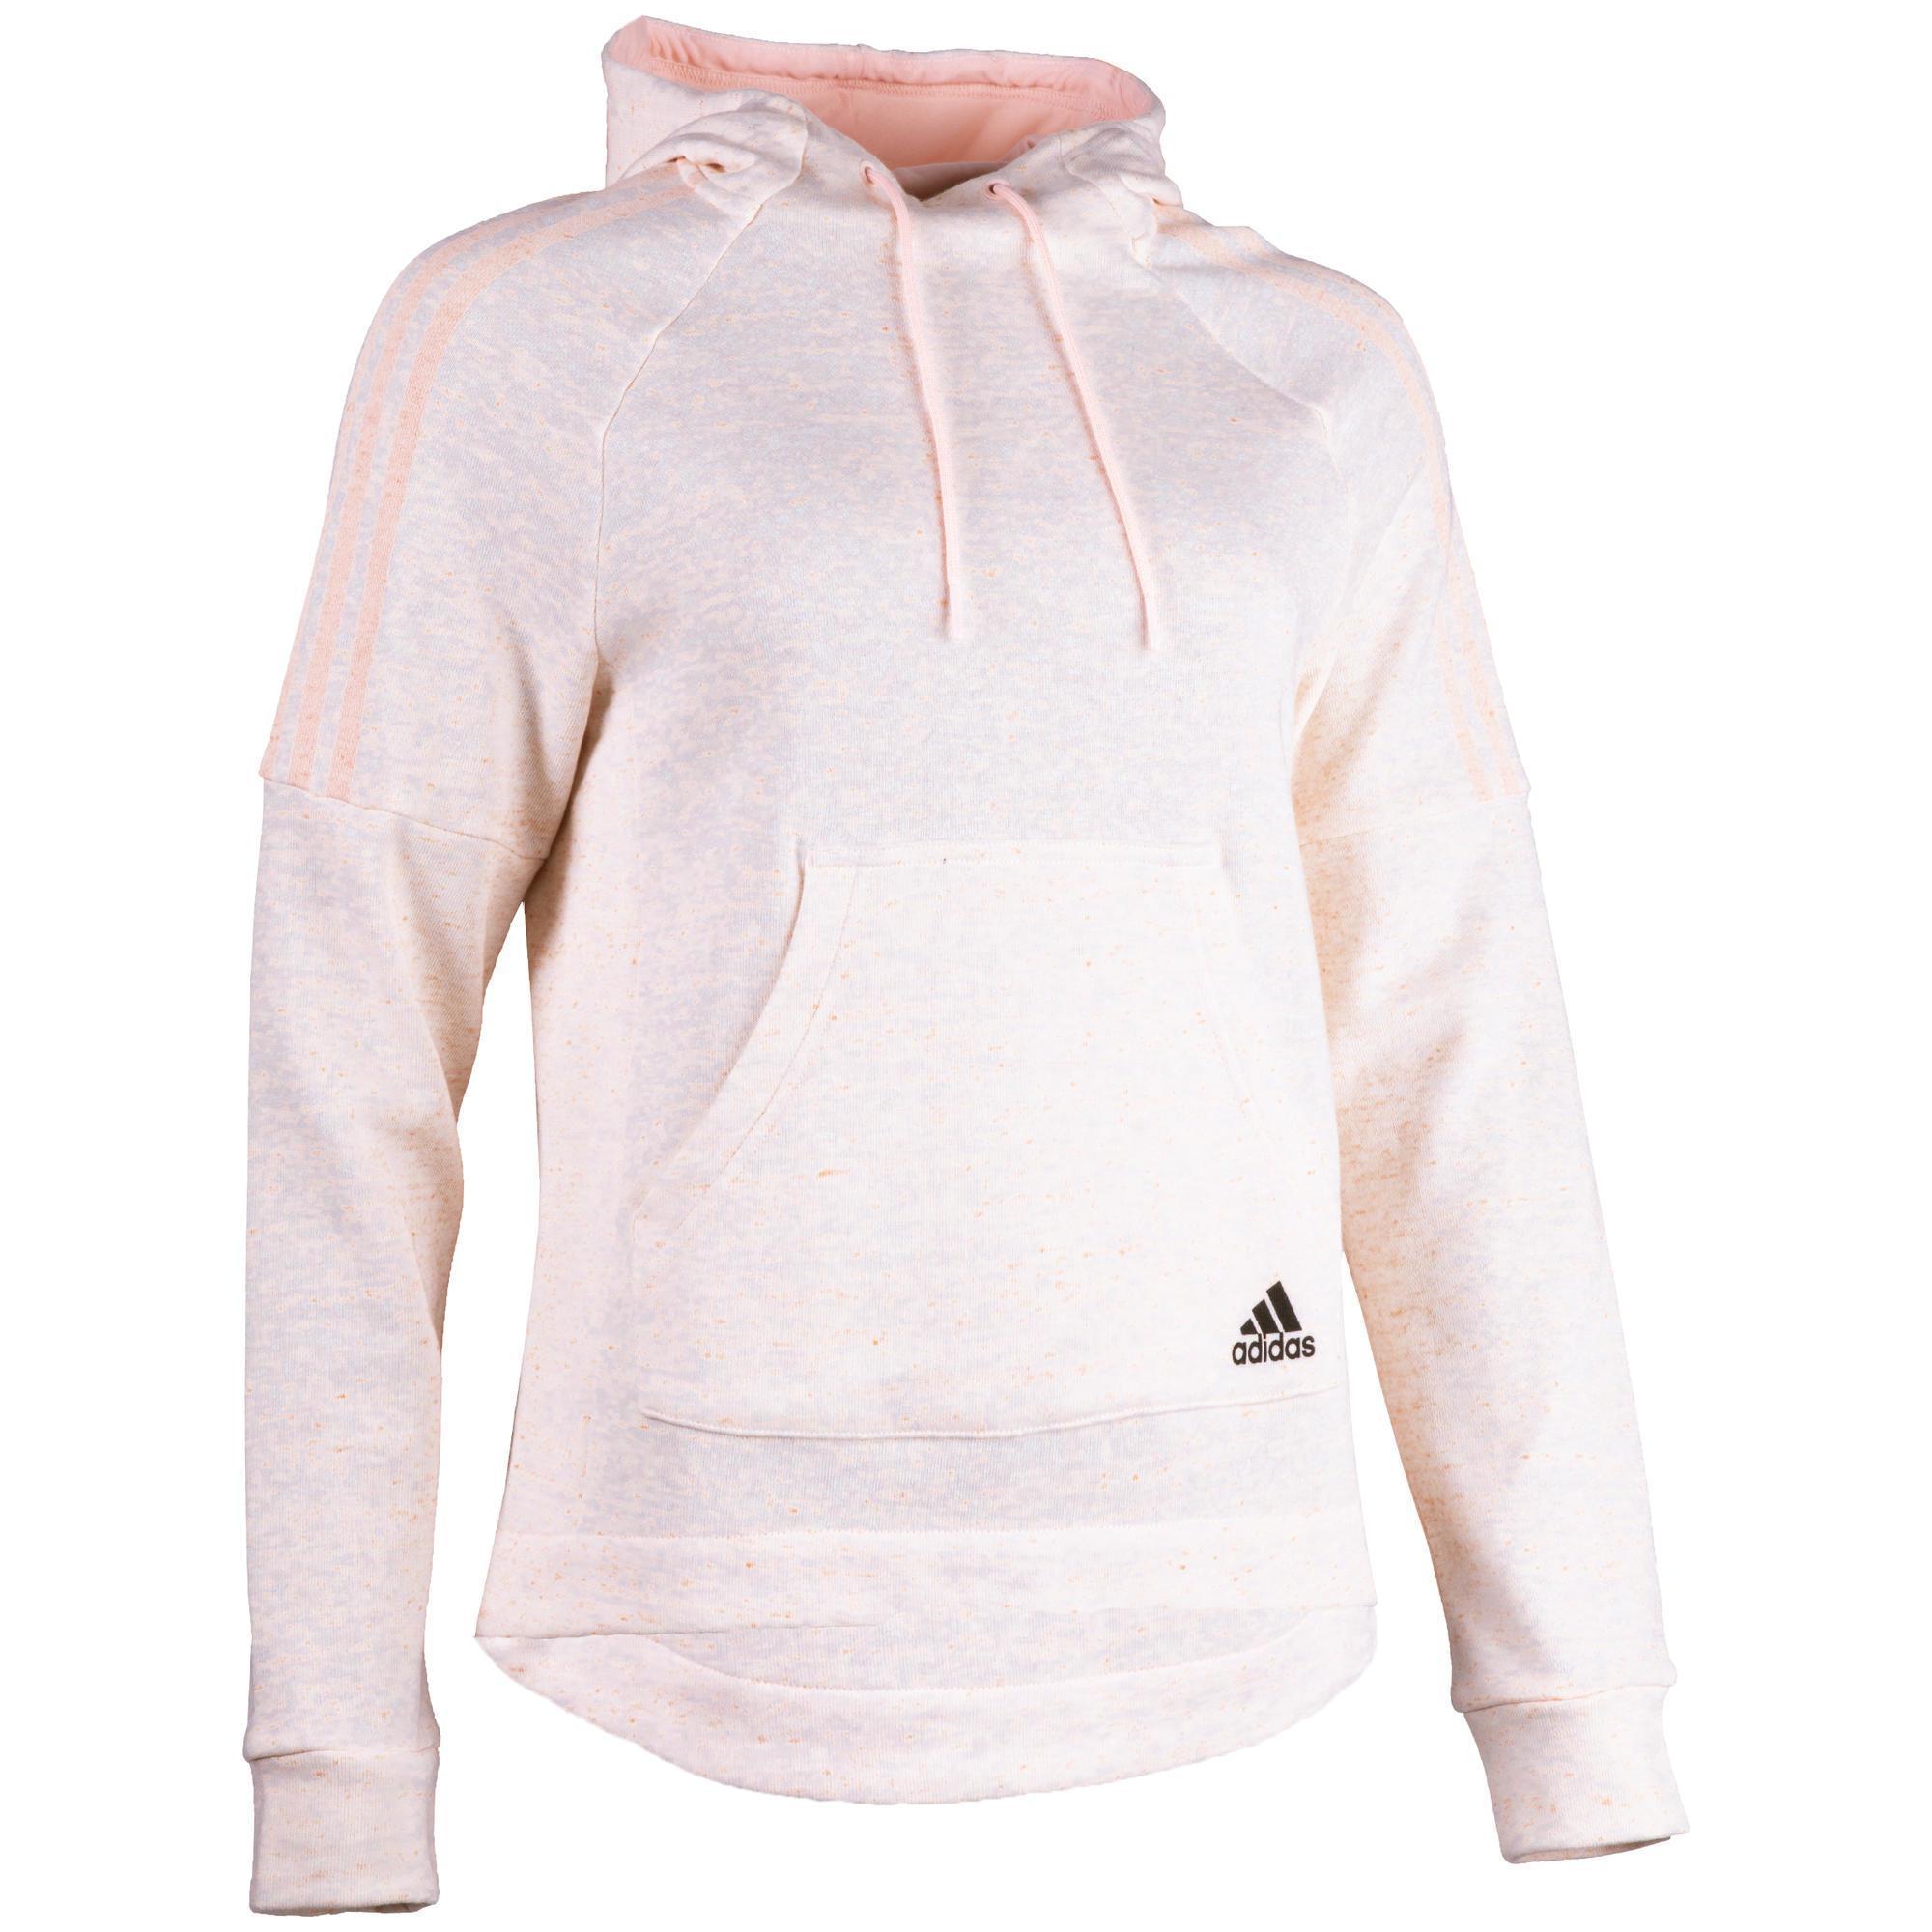 6d10be50c3c6c Sudadera De Chándal Con Capucha Gimnasia Pilates Adidas 500 Bolsillo Mujer  Rosa Adidas